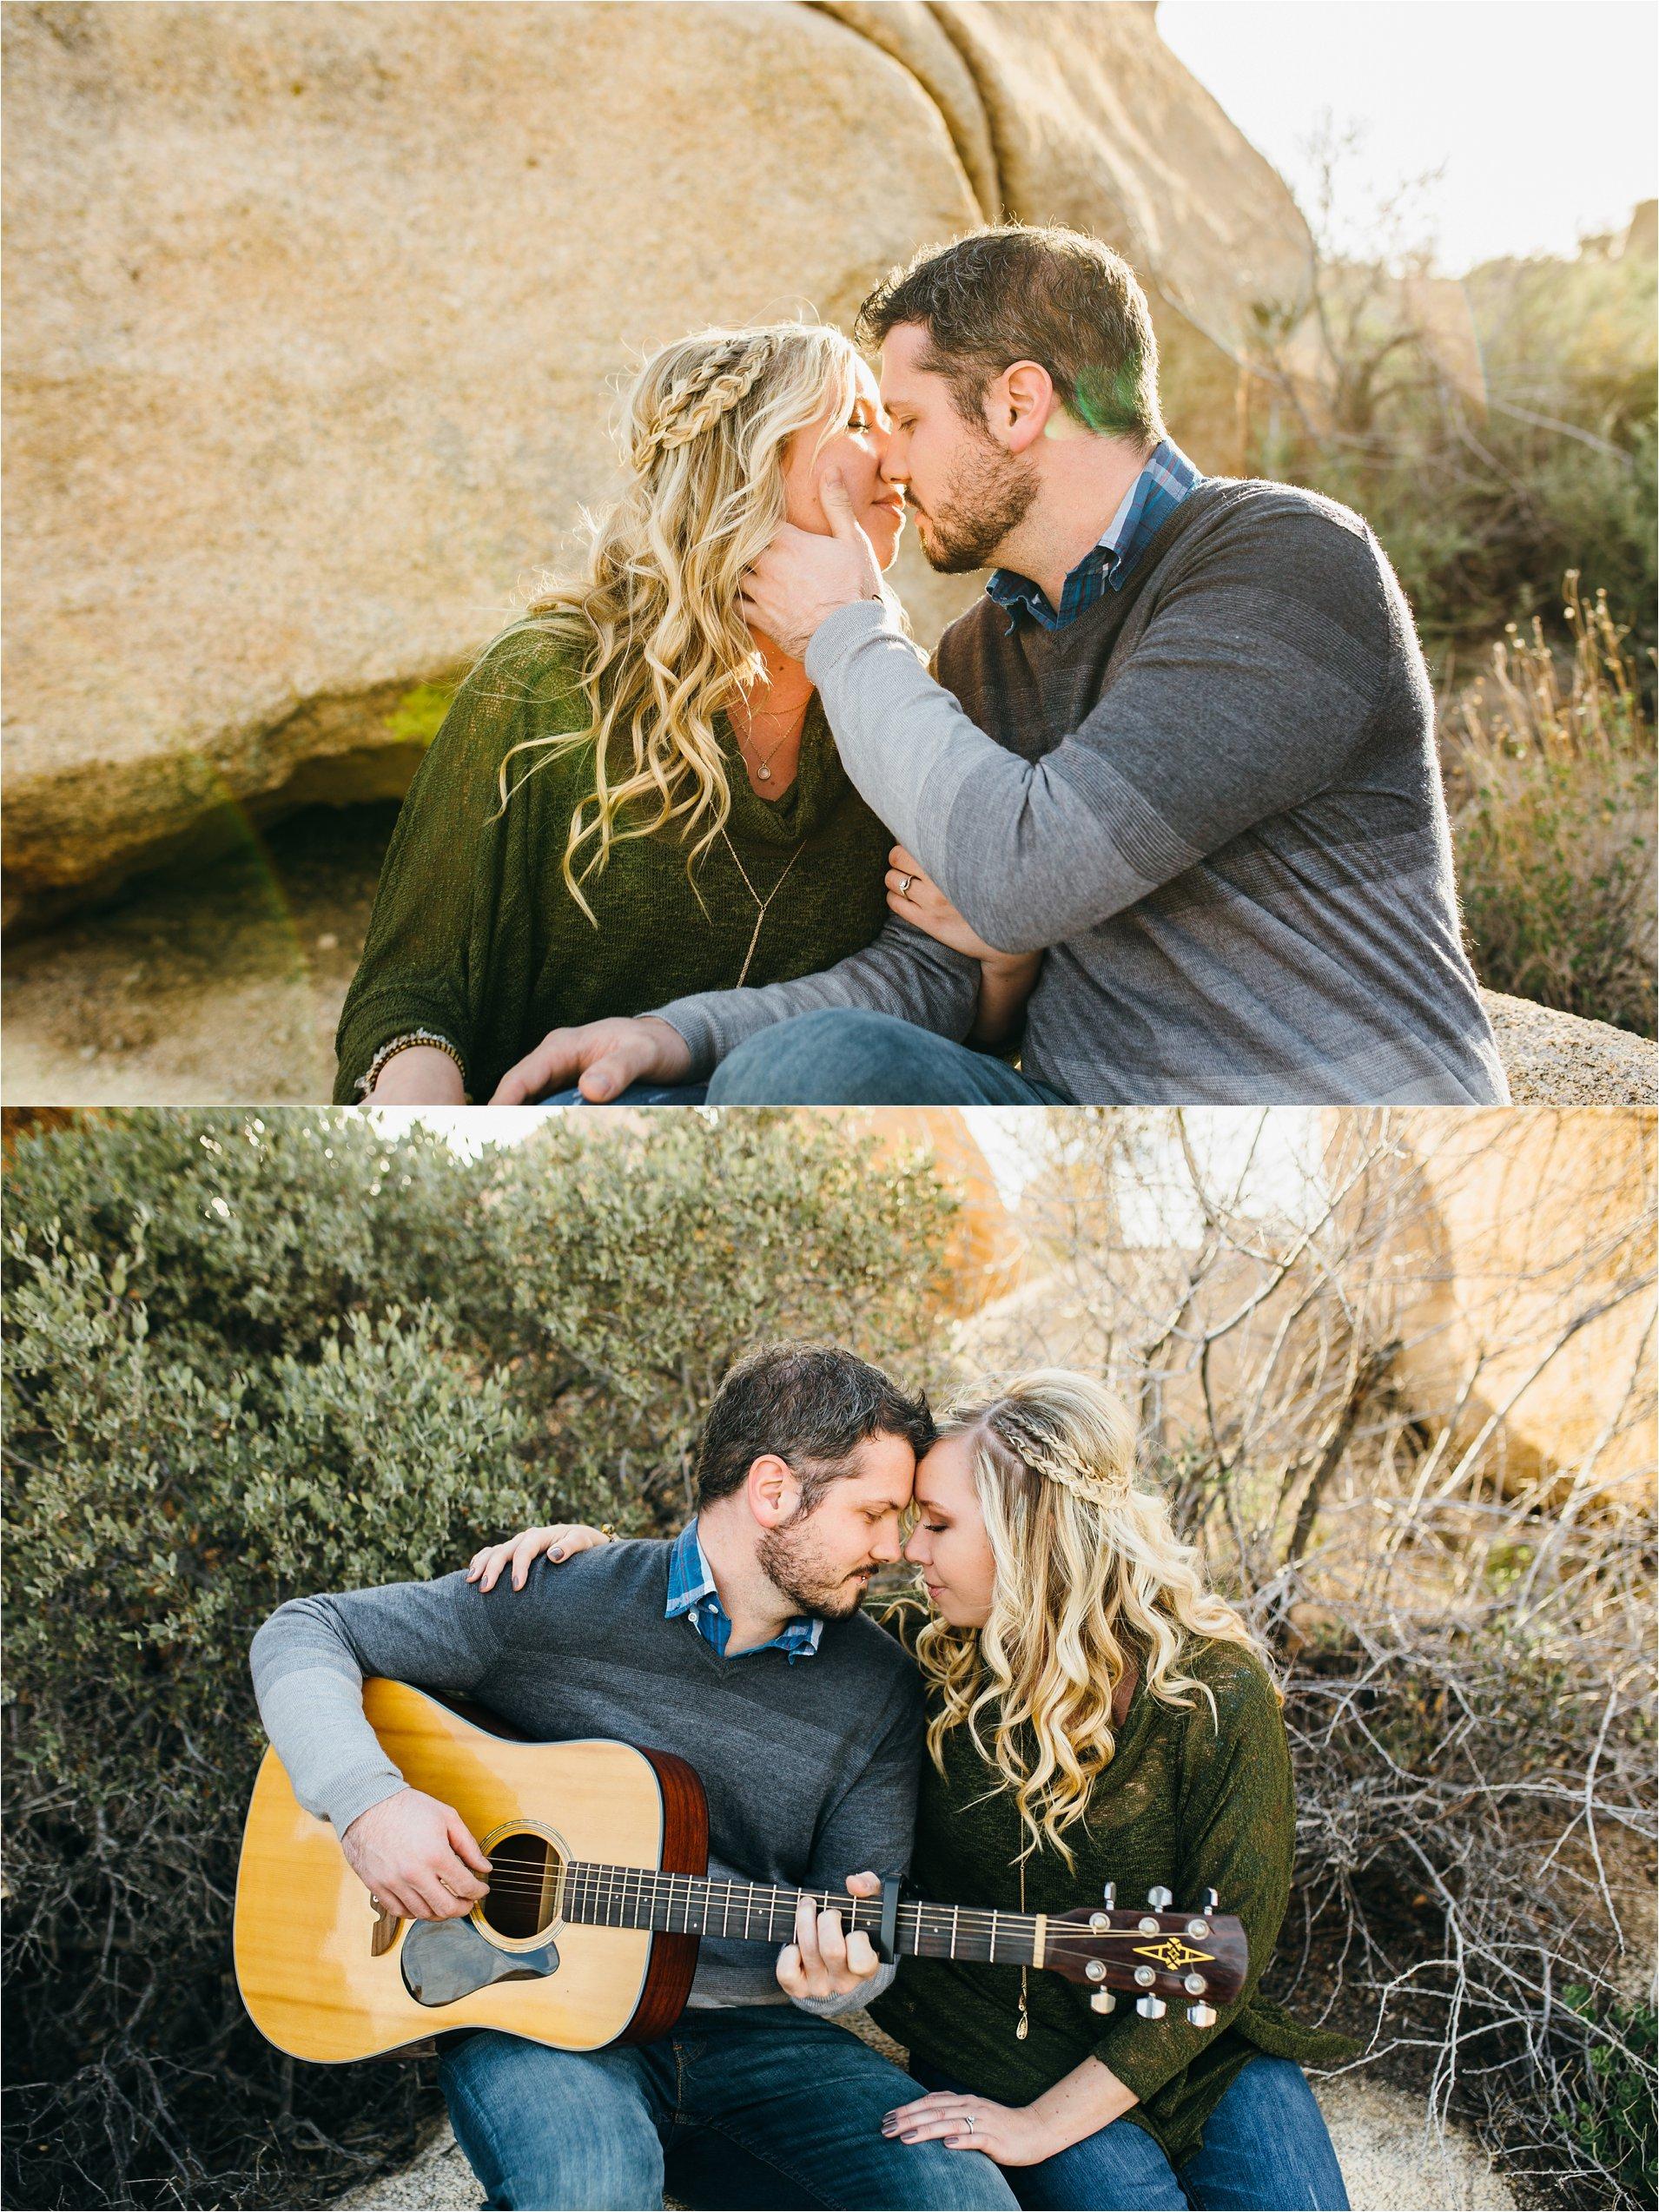 Romantic Engagement Photos